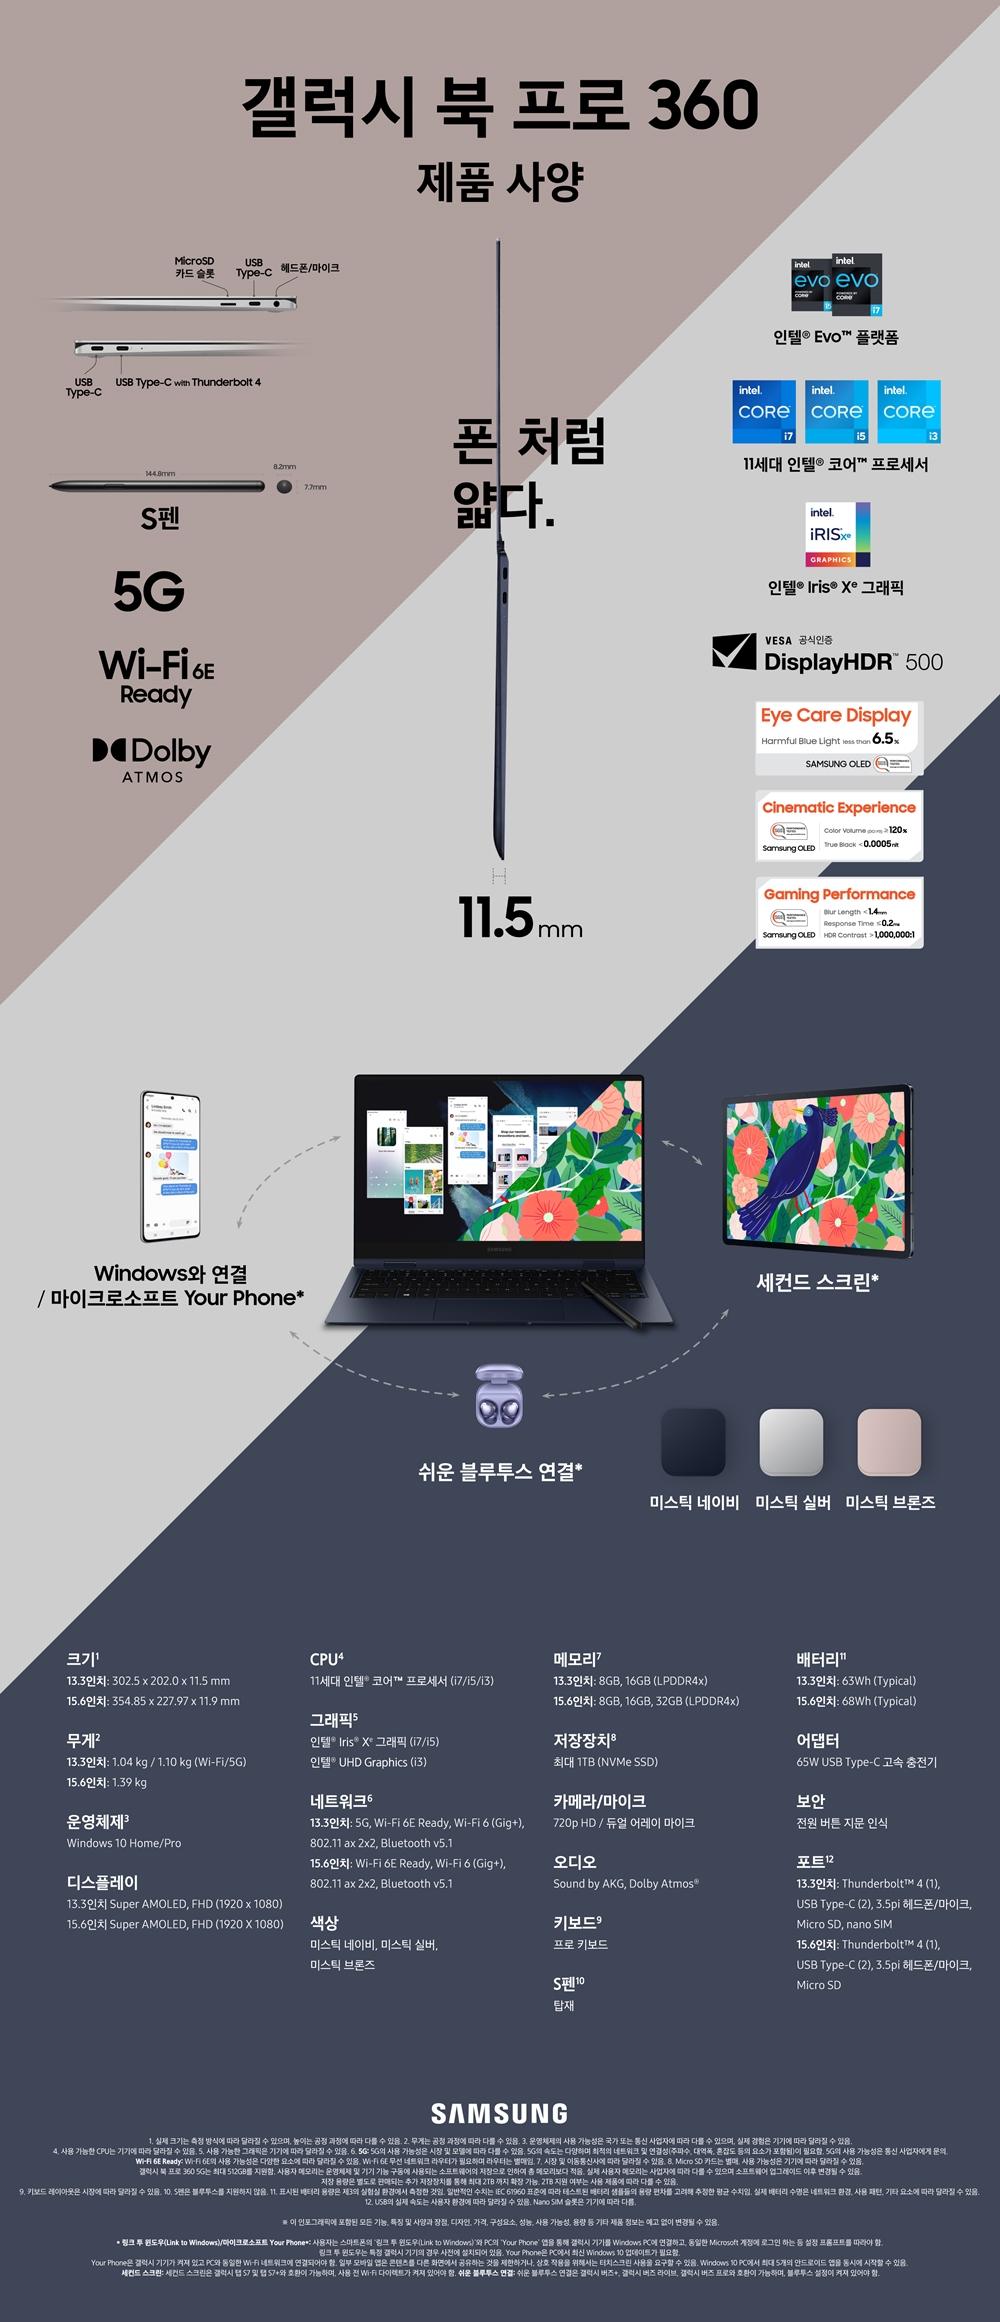 갤럭시 북 프로 360 제품 사양 MicroSD 카드 슬롯 USB 3.2 헤드폰/마이크 USB Type-C, USB Type-C with Thunderbolt 4  인텔 Evo 플랫폼 11세대 인텔 코어 프로세서   S펜 길이 144.8mm 두께 7.7mm x 8.2mm  5G LTE Wi-Fi 6E Ready  인텔 Iris X 그래픽  Dolby ATMOS VESA 공식인증 DisplayHDR 500  Cinematic Experience Samsung OLED Color Volune(DCI P3) >= 120% True Black < 0.0005nit  Gaming Performance Samsung OLED Blure Length < 1.4mm Response Time =< 0.2ms HDR Contrast > 1,000,000:1  Eye Care Display Harmful Blue Light less than 6.5% Samsung OLED  폰처럼 얇다. 11.5mm  Windows와 연결 마이크로소프트 Your Phone* 쉬운 블루투스 연결* 세컨드 스크린*  미스틱 네이비 / 미스틱 실버 / 미스틱 브론즈  크기(실제 크기는 측정 방식에 따라 달라질 수 있으며, 높이는 공정 과정에 따라 다를 수 있음.) 13.3인치: 302.5 x 202.0 x 11.5mm 15.6인치: 354.85 x 227.97 x 11.9  무게(무게는 공정 과정에 따라 다를 수 있음.) 13.3인치: 1.04kg / 1.10kg (Wi-Fi/5G) 15.6인치: 1.39kg   운영체제(운영체제의 사용 가능성은 지역 또는 통신 사업자에 따라 다를 수 있으며, 실제 경험은 기기에 따라 달라질 수 있음) Windows 10 Home/Pro  디스플레이  13.3인치 Super AMOLED, FHD (1,920 x 1,080) 15.6인치 Super AMOLED, FHD (1,920 x 1,080)  CPU(사용 가능한 CPU는 기기에 따라 달라질 수 있음) 11세대 인텔® 코어™ 프로세서(i7/i5/i3)  그래픽(사용 가능한 그래픽은 기기에 따라 달라질 수 있음) 인텔® Iris® Xe 그래픽(i7, i5) 인텔® UHD Graphics (i3)  네트워크 (5G: 5G의 사용 가능성은 시장 및 모델에 따라 다를 수 있음. 5G의 속도는 다양하며 최적의 네트워크 및 연결성(주파수, 대역폭, 혼잡도 등의 요소가 포함됨)이 필요함. 5G의 사용 가능성은 통신 사업자에게 문의. Wi-Fi 6E Ready: Wi-Fi 6E의 사용 가능성은 다양한 요소에 따라 달라질 수 있음. Wi-Fi 6E 무선 네트워크 라우터가 필요하며 라우터는 별매임) 13.3인치: 5G, Wi-Fi 6E Ready, 802.11 ax 2x2, Bluetooth v5.1 15.6인치: Wi-Fi 6E Ready, Wi-Fi 6(Gig+), 802.11 ax 2x2, Bluetooth v5.1  색상 미스틱 네이비, 미스틱 실버, 미스틱 브론즈  메모리(시장 및 이동통신사에 따라 달라질 수 있음) 13.3인치: 8GB, 16GB (LPDDR4x) 15.6인치: 8GB, 16GB, 32GB (LPDDR4x)  저장장치(Micro SD카드는 별매. 사용 가능성은 기기에 따라 달라질 수 있음. 갤럭시 북 프로 360 5G는 최대 512GB를 지원함. 사용자 메모리는 운영체제 및 기기 기능 구동에 사용되는 소프트웨어의 저장으로 인하여 총 메모리보다 적음. 실제 사용자 메모리는 사업자에 따라 다를 수 있으며 소프트웨어 업그레이드 이후 변경될 수 있음. 저장 용량은 별도로 판매되는 추가 저장장치를 통해 최대 2TB까지 확장 가능. 2TB 지원 여부는 사용 제품에 따라 다를 수 있음.) 최대 1TB(NVMe SSD)  카메라/마이크 720p HD, 듀얼 배열 마이크  오디오  Sound by AKG, 돌비 애트모스(Dolby Atmos®)  키보드(키보드 레이아웃은 시장에 따라 달라질 수 있음) 프로 키보드  S펜(S펜은 블루투스를 지원하지 않음) 탑재  배터리(표시된 